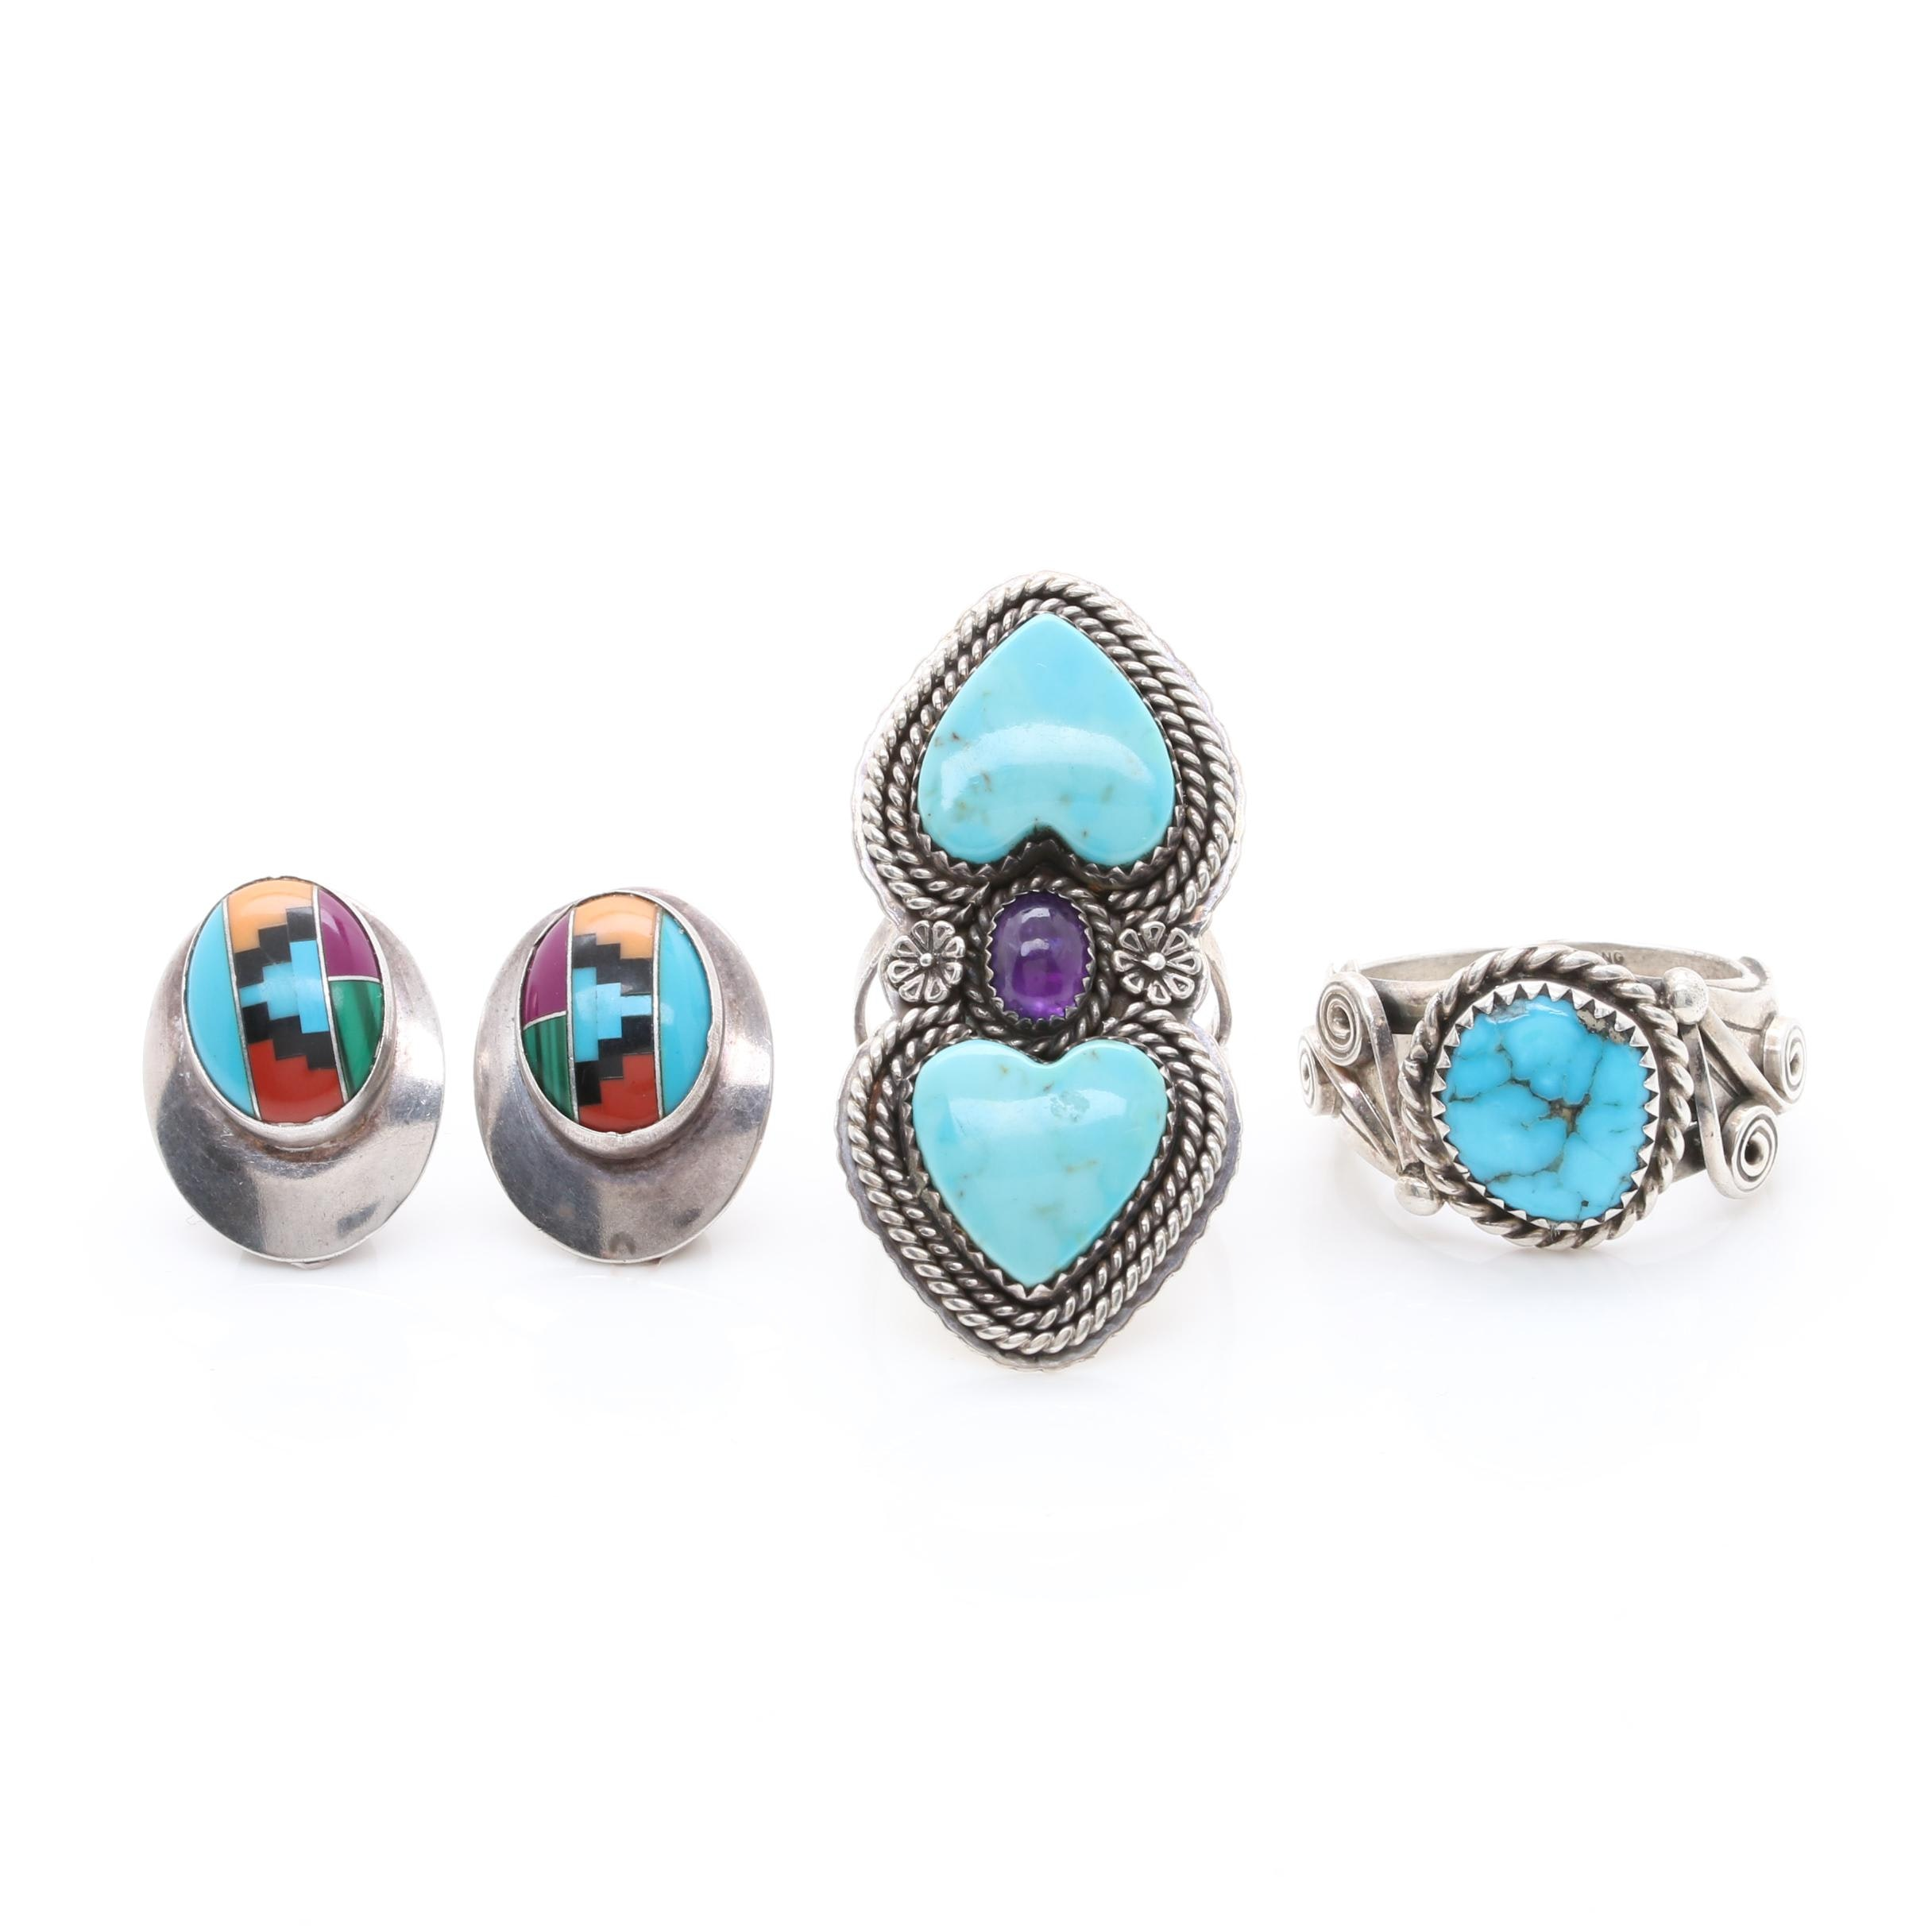 Southwestern Style Sterling Silver Jewelry Including Lila Yaxakia Zuni